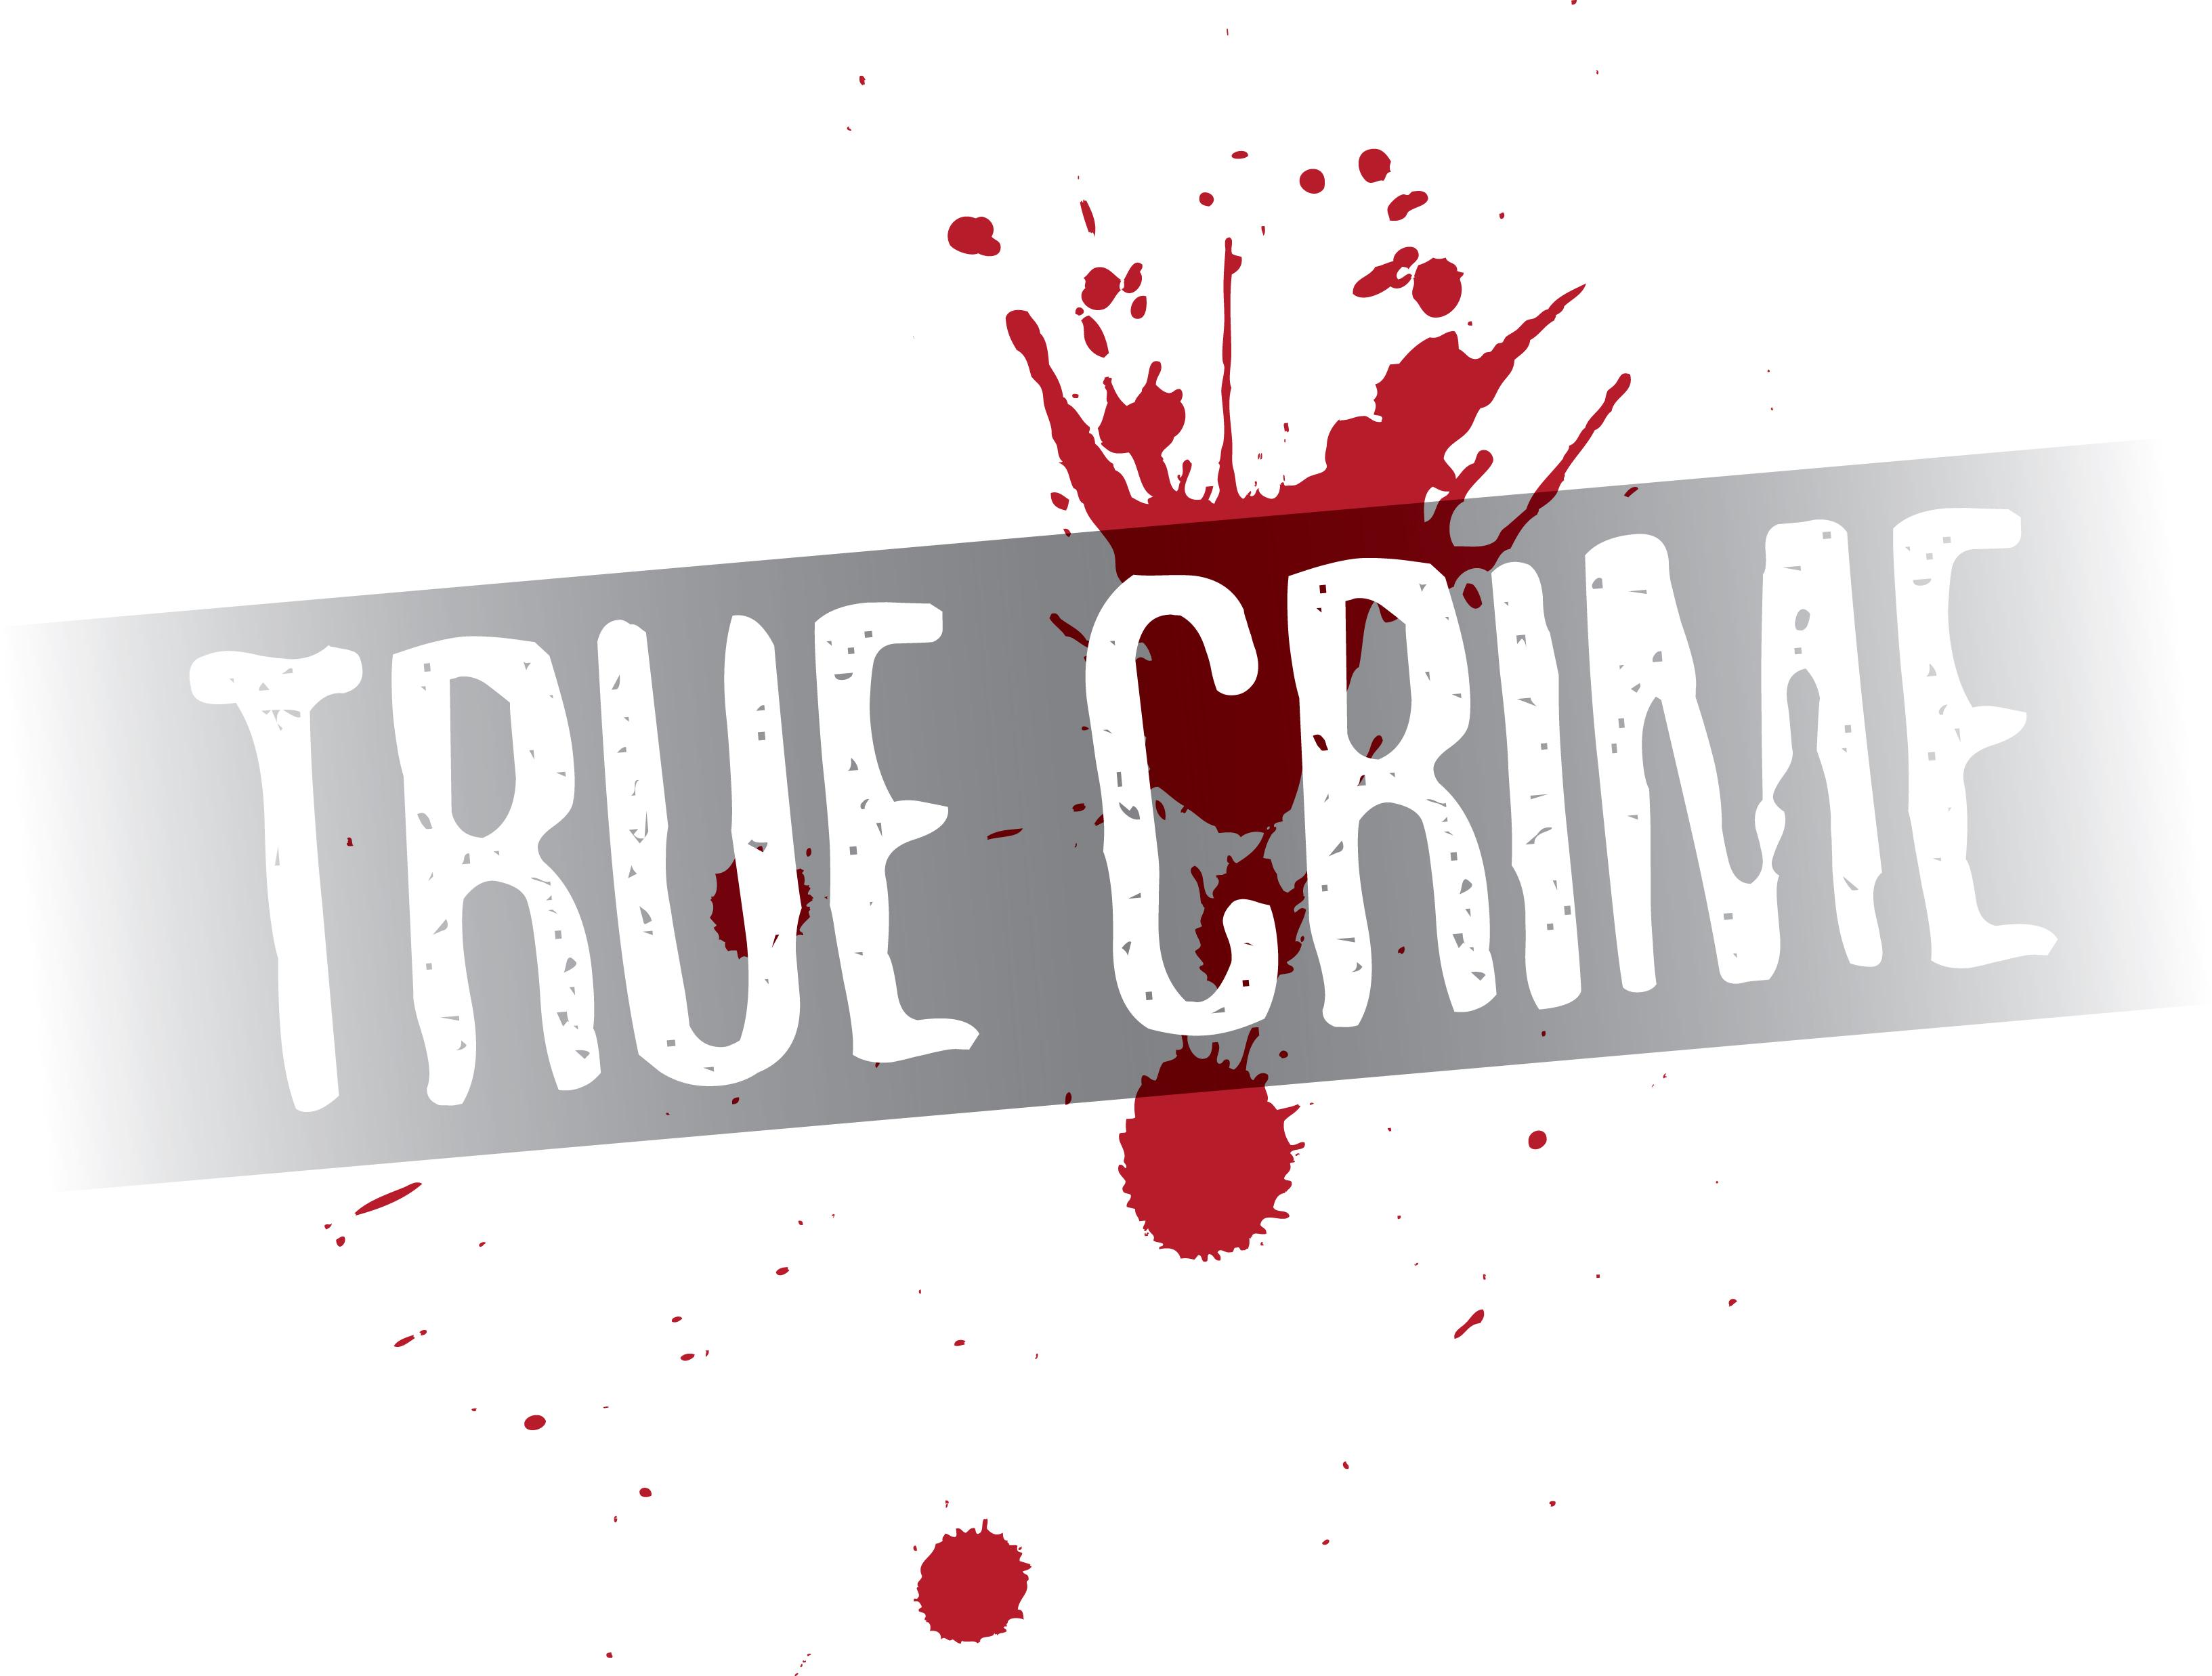 truecrime-logo.jpg